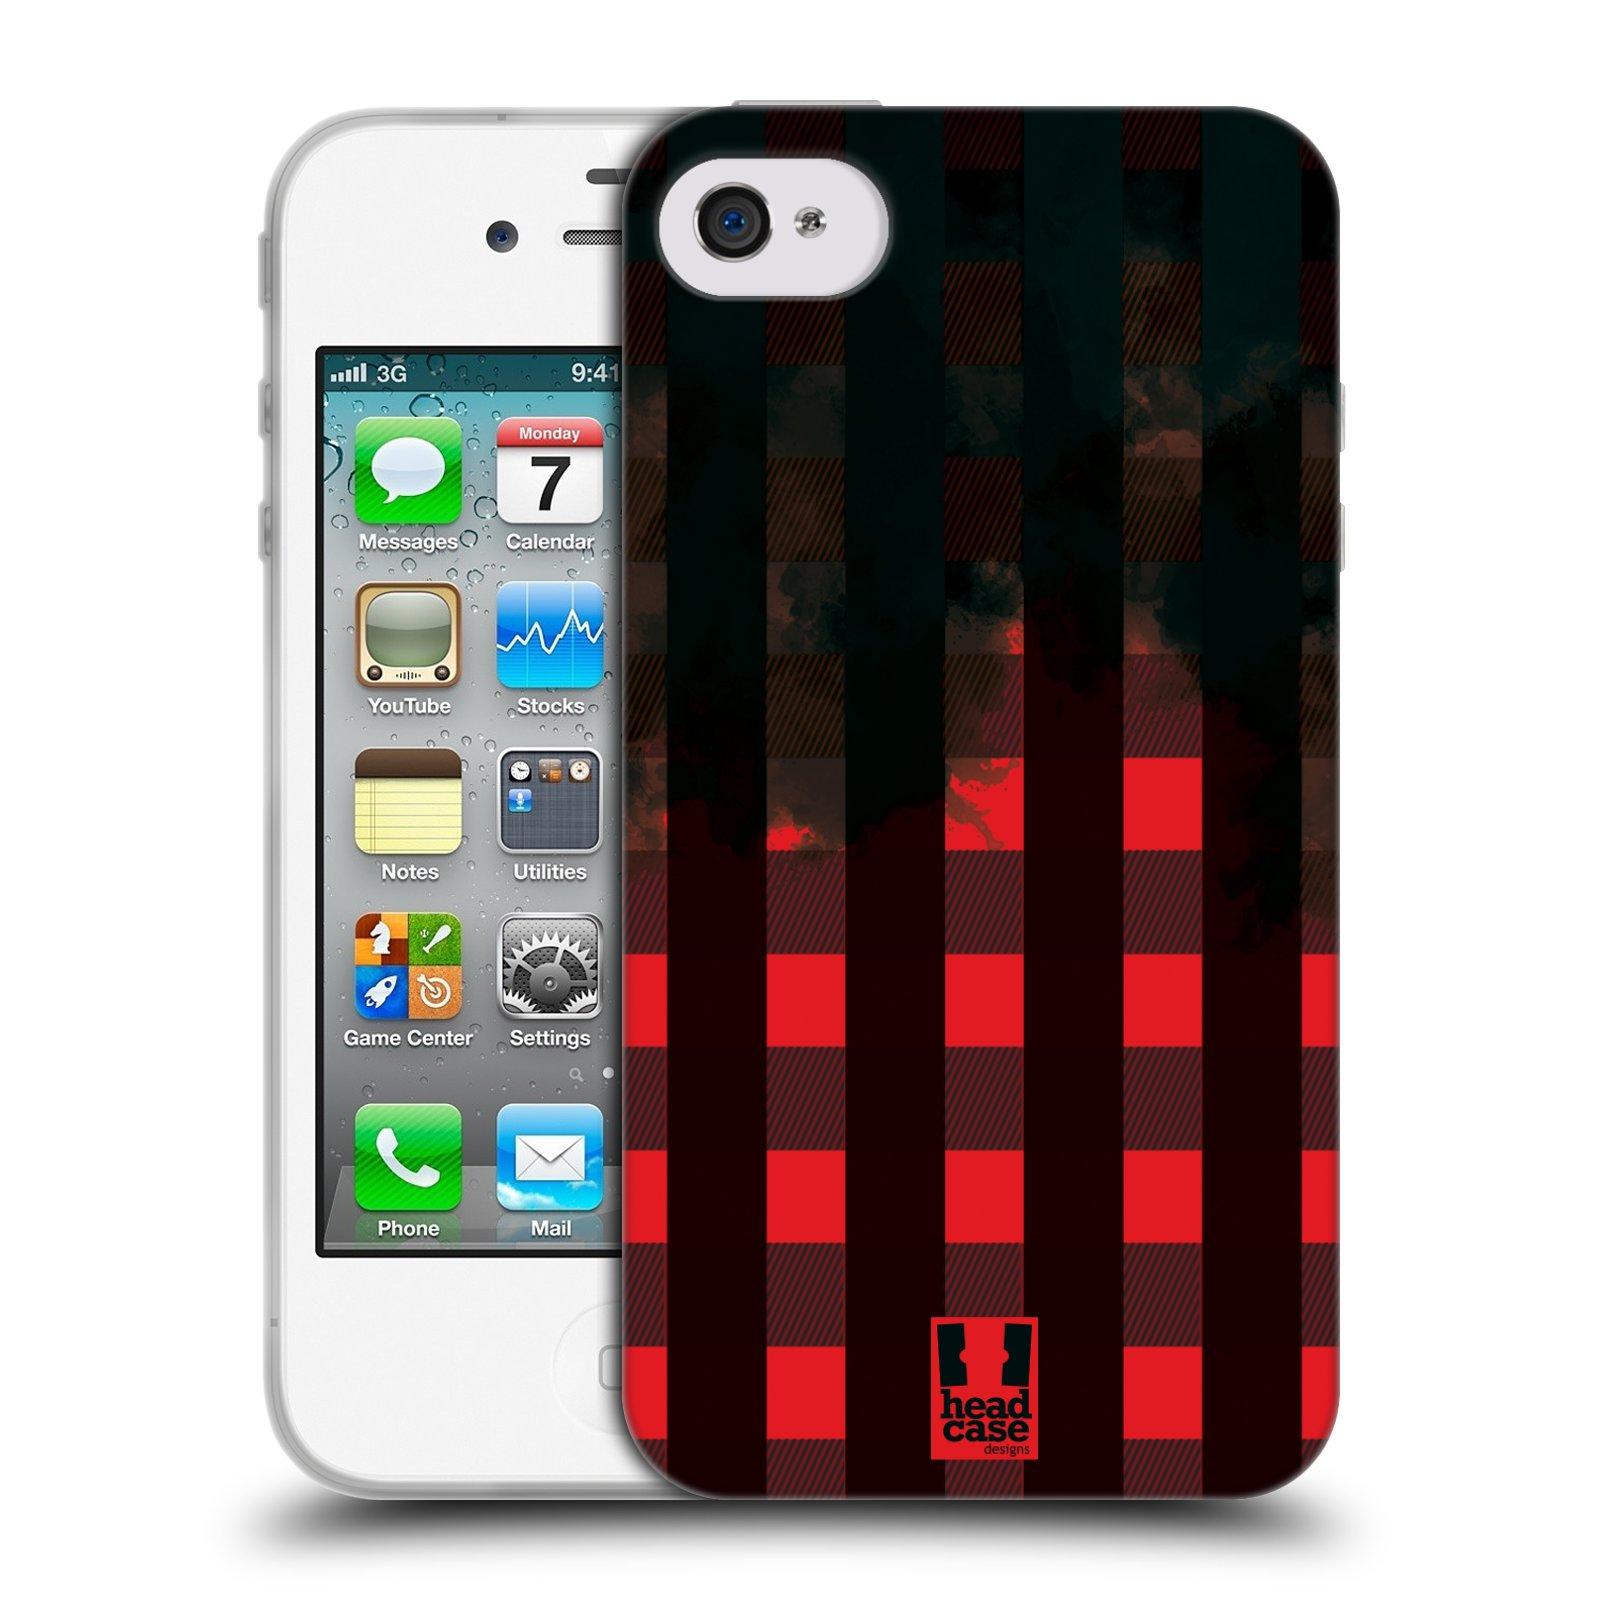 Silikonové pouzdro na mobil Apple iPhone 4 a 4S HEAD CASE FLANEL RED BLACK (Silikonový kryt či obal na mobilní telefon Apple iPhone 4 a 4S)